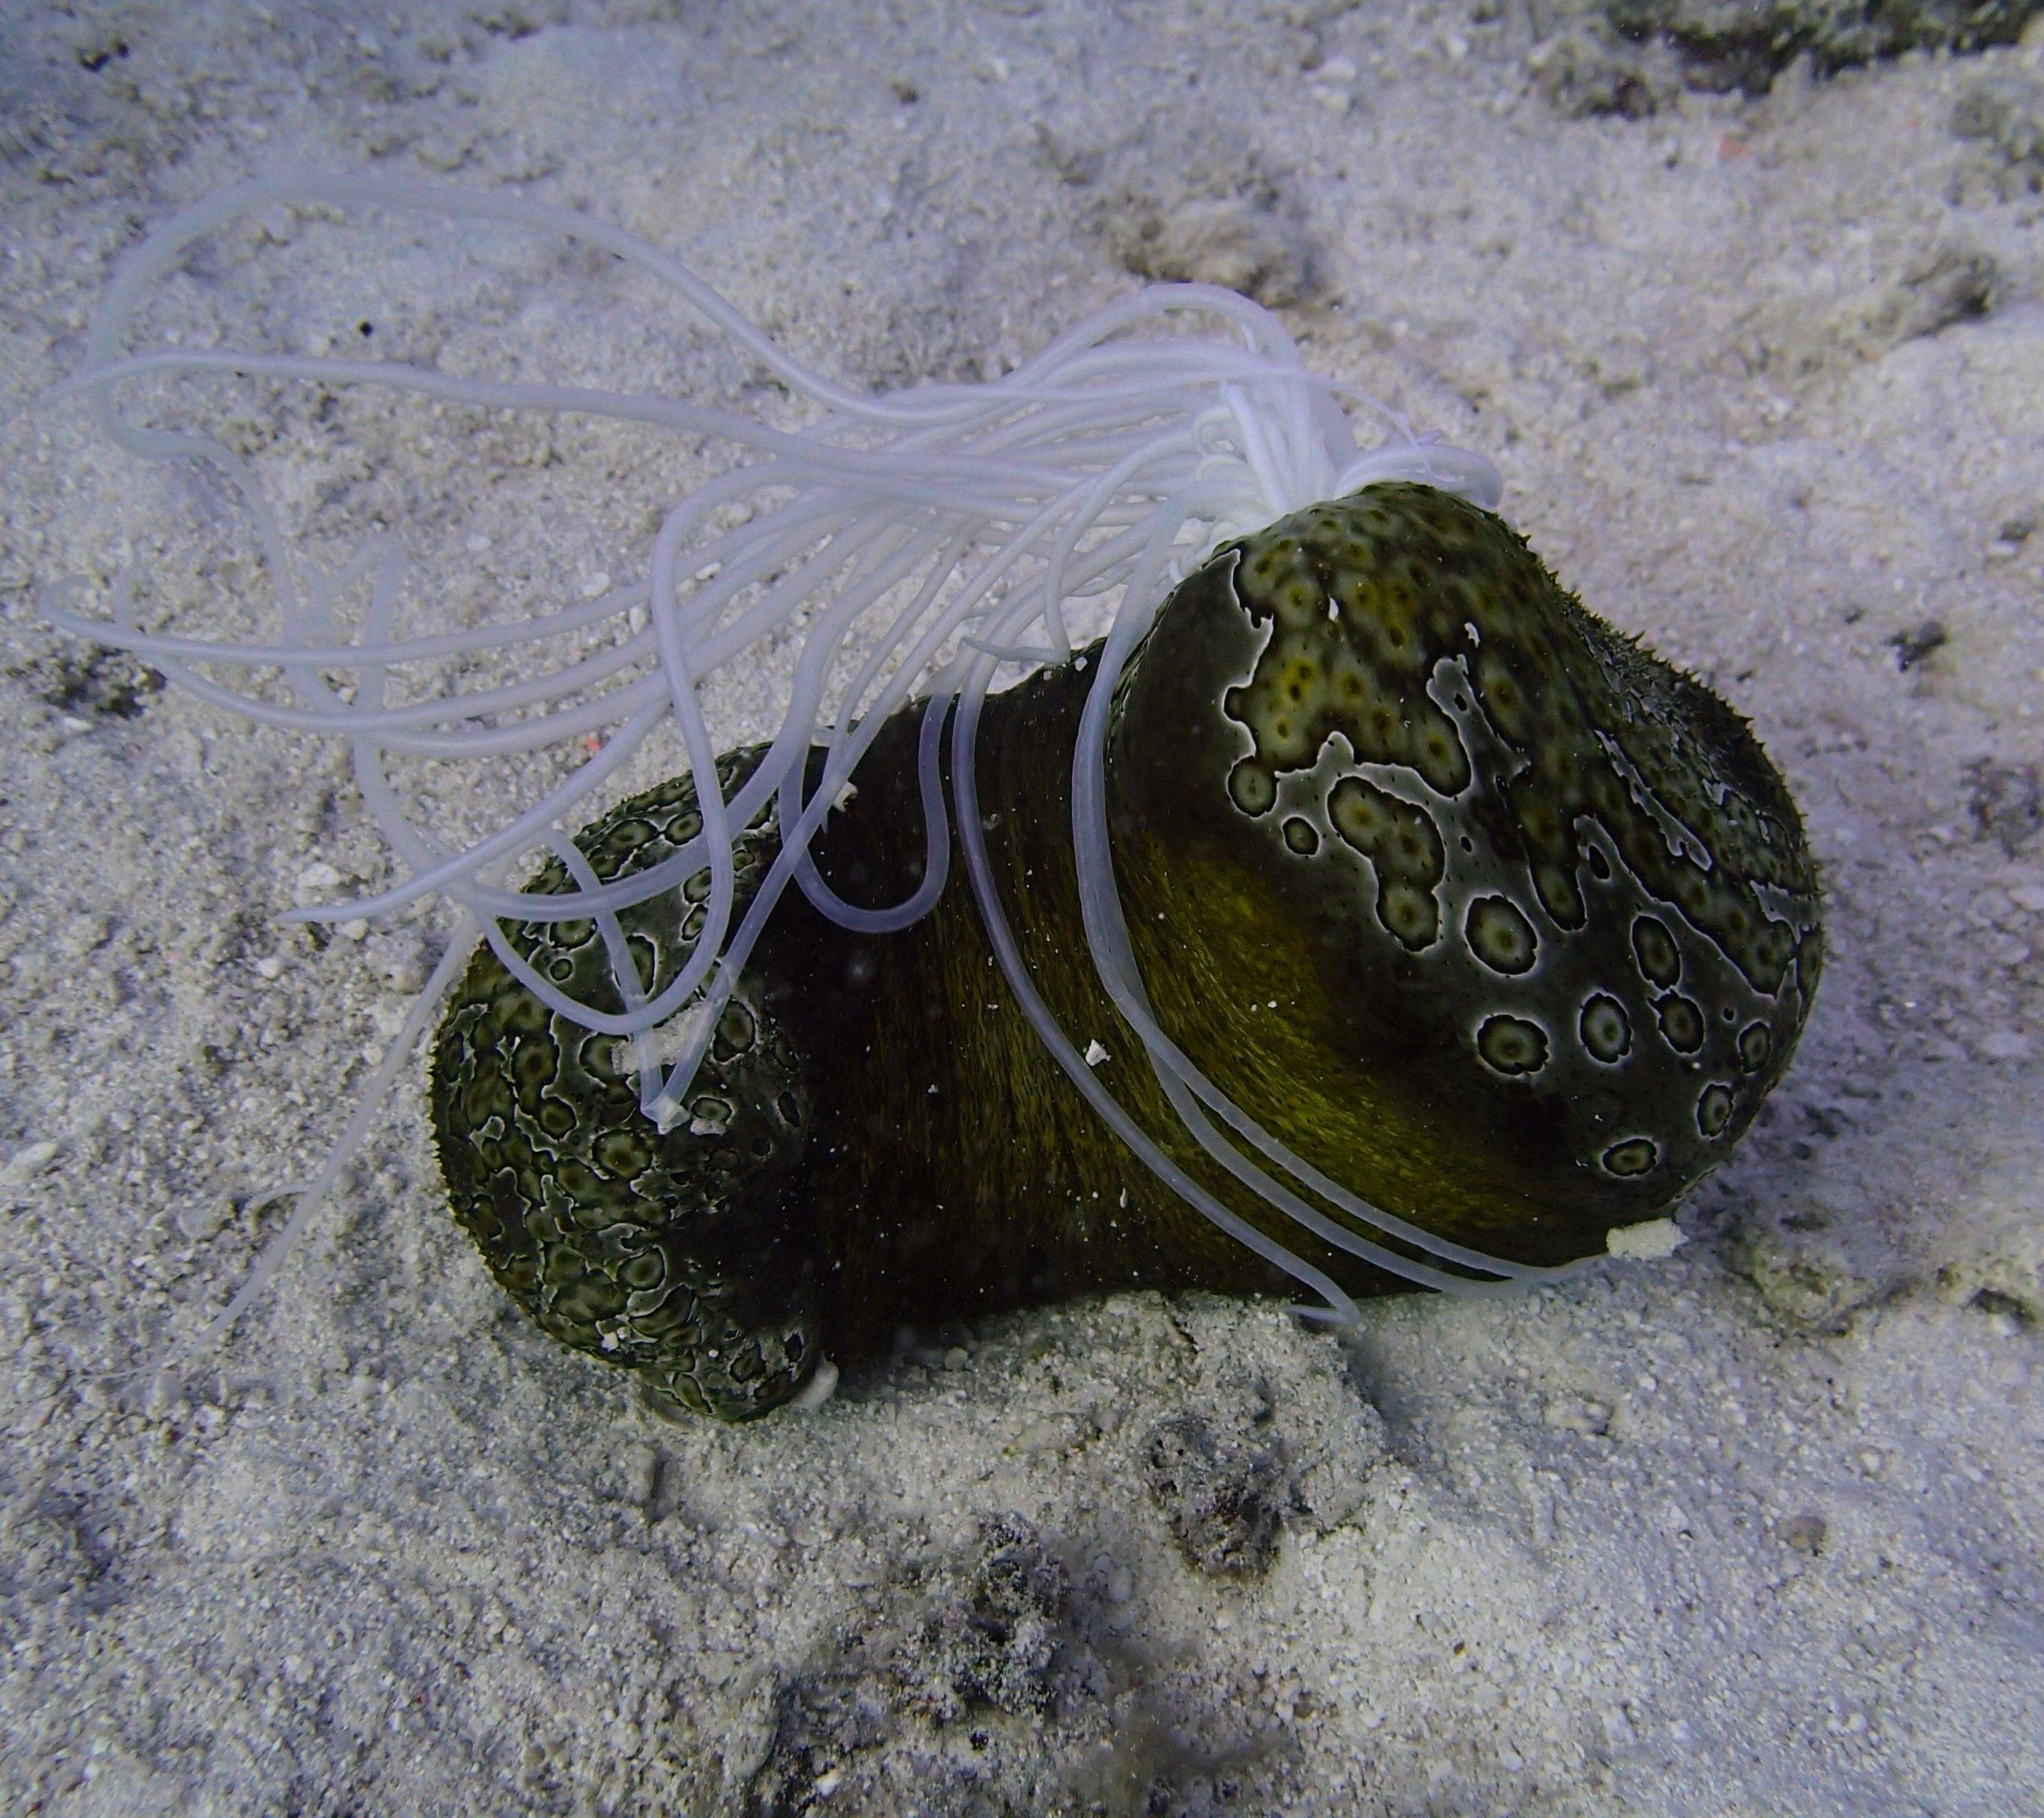 eviscerating sea cucumber.jpg